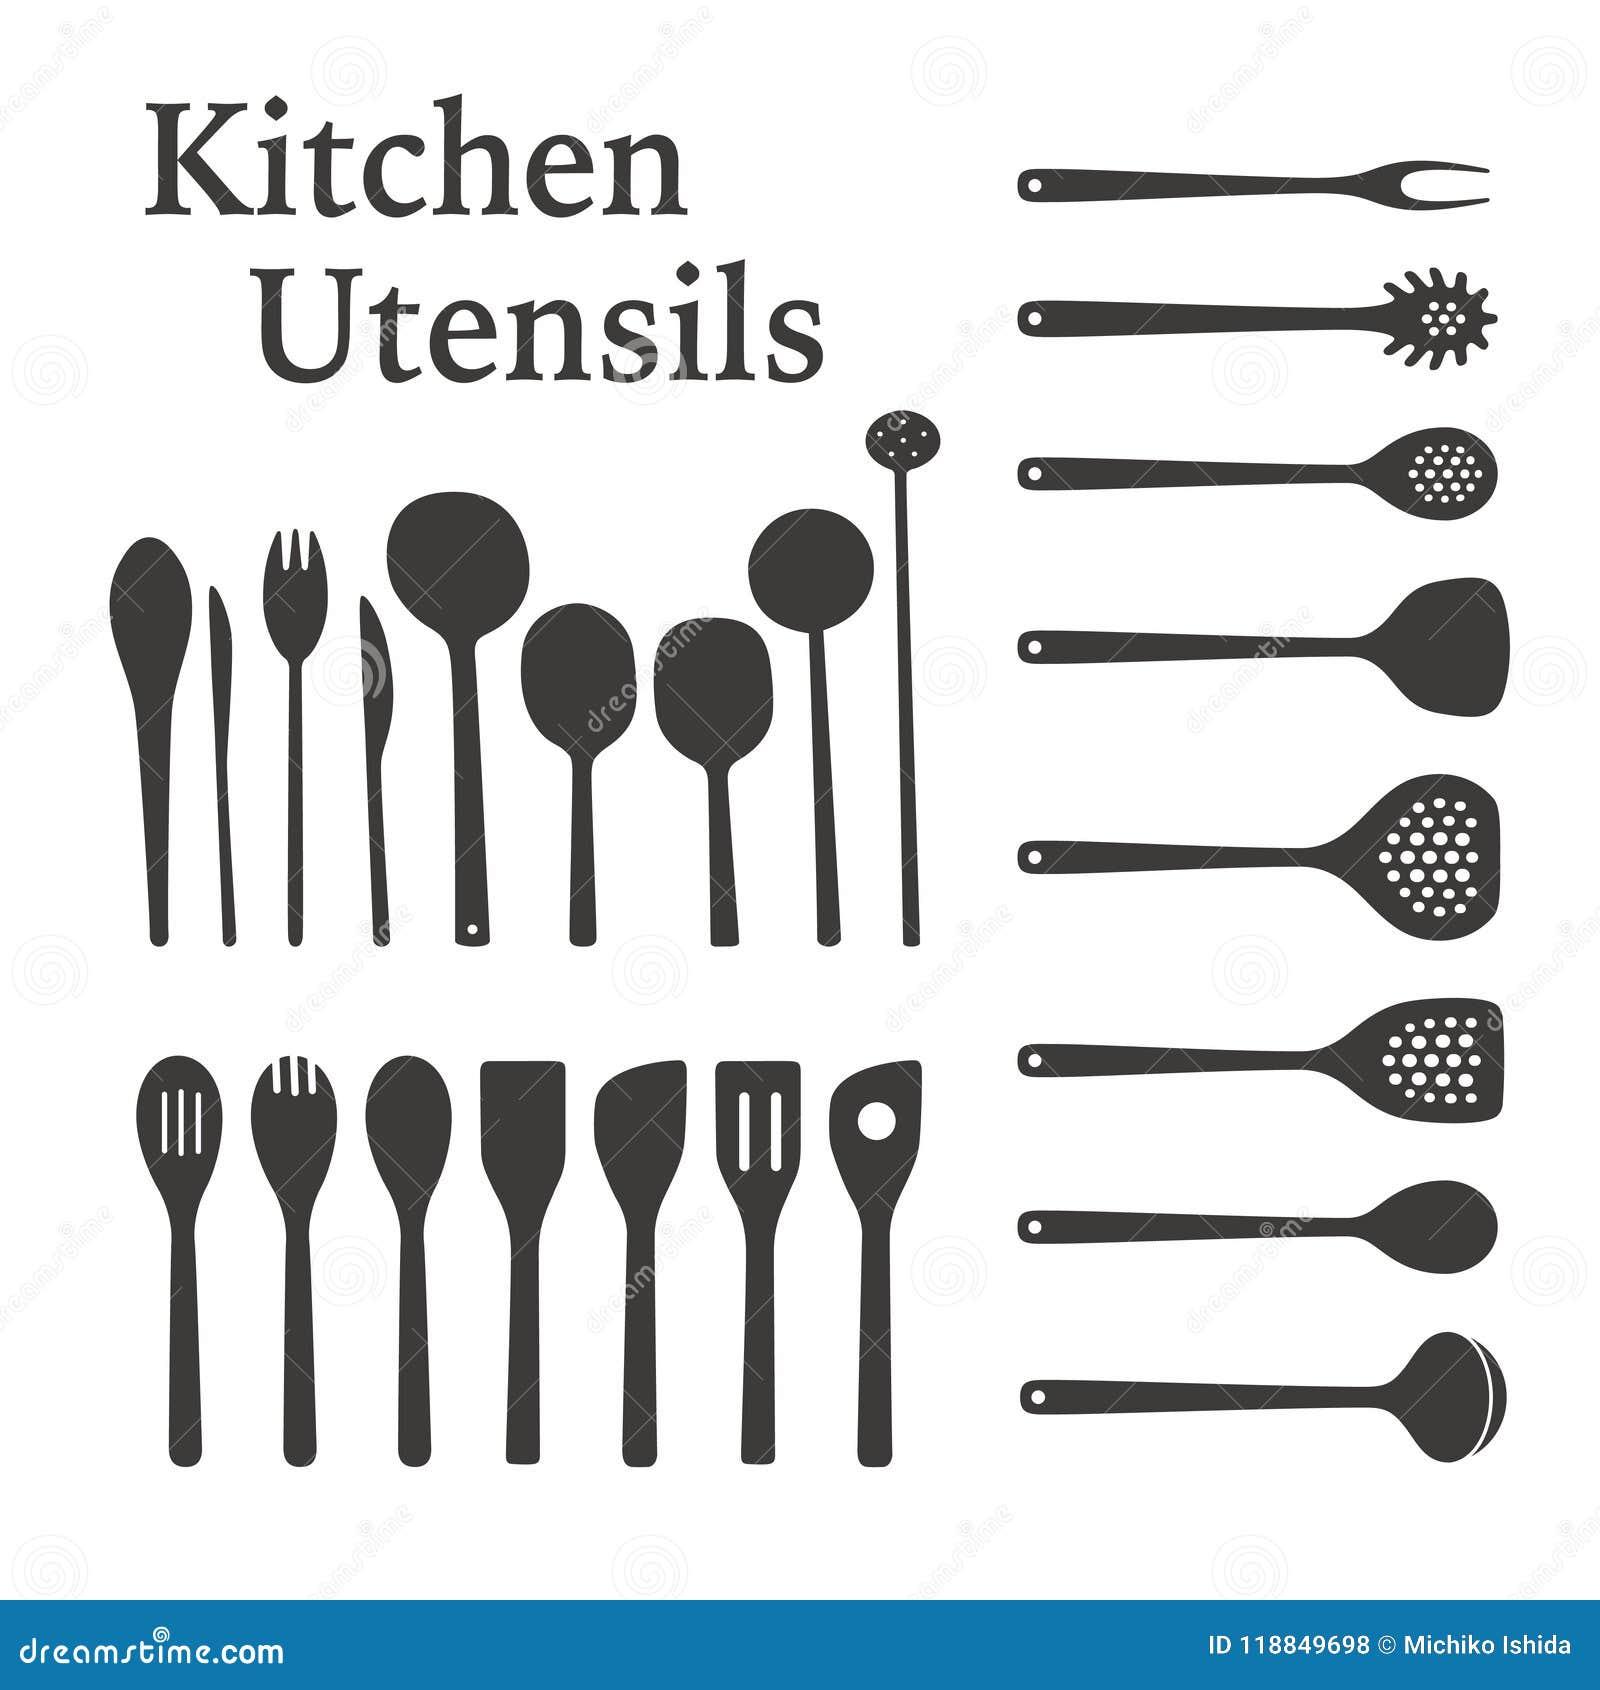 Dream Kitchen Utensils: Kitchen Utensils Silhouette Stock Illustrations